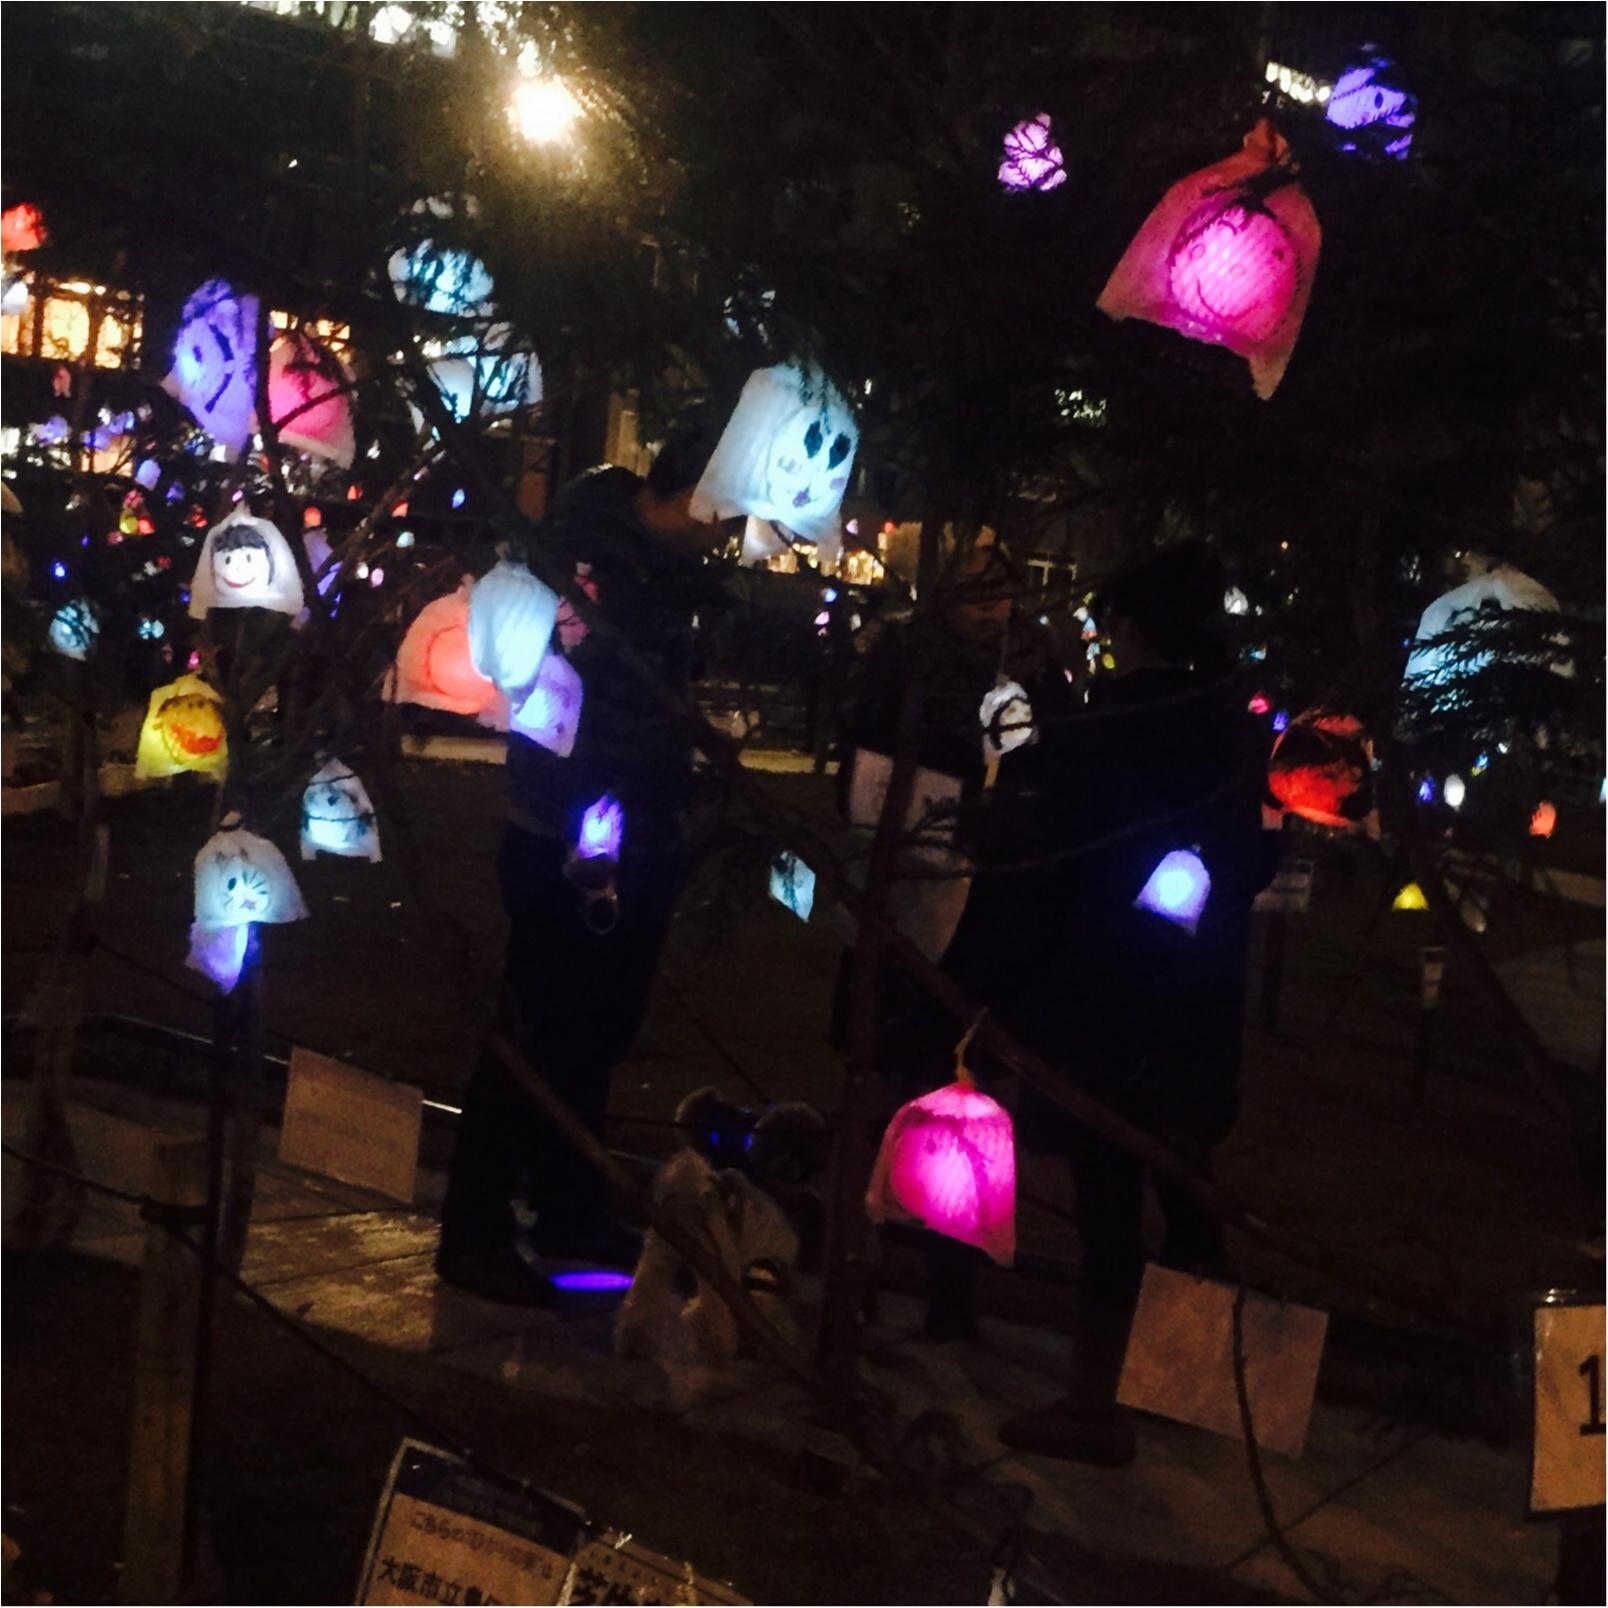 OSAKA光のルネサンス♡中之島を散歩するなら今しかない!_3